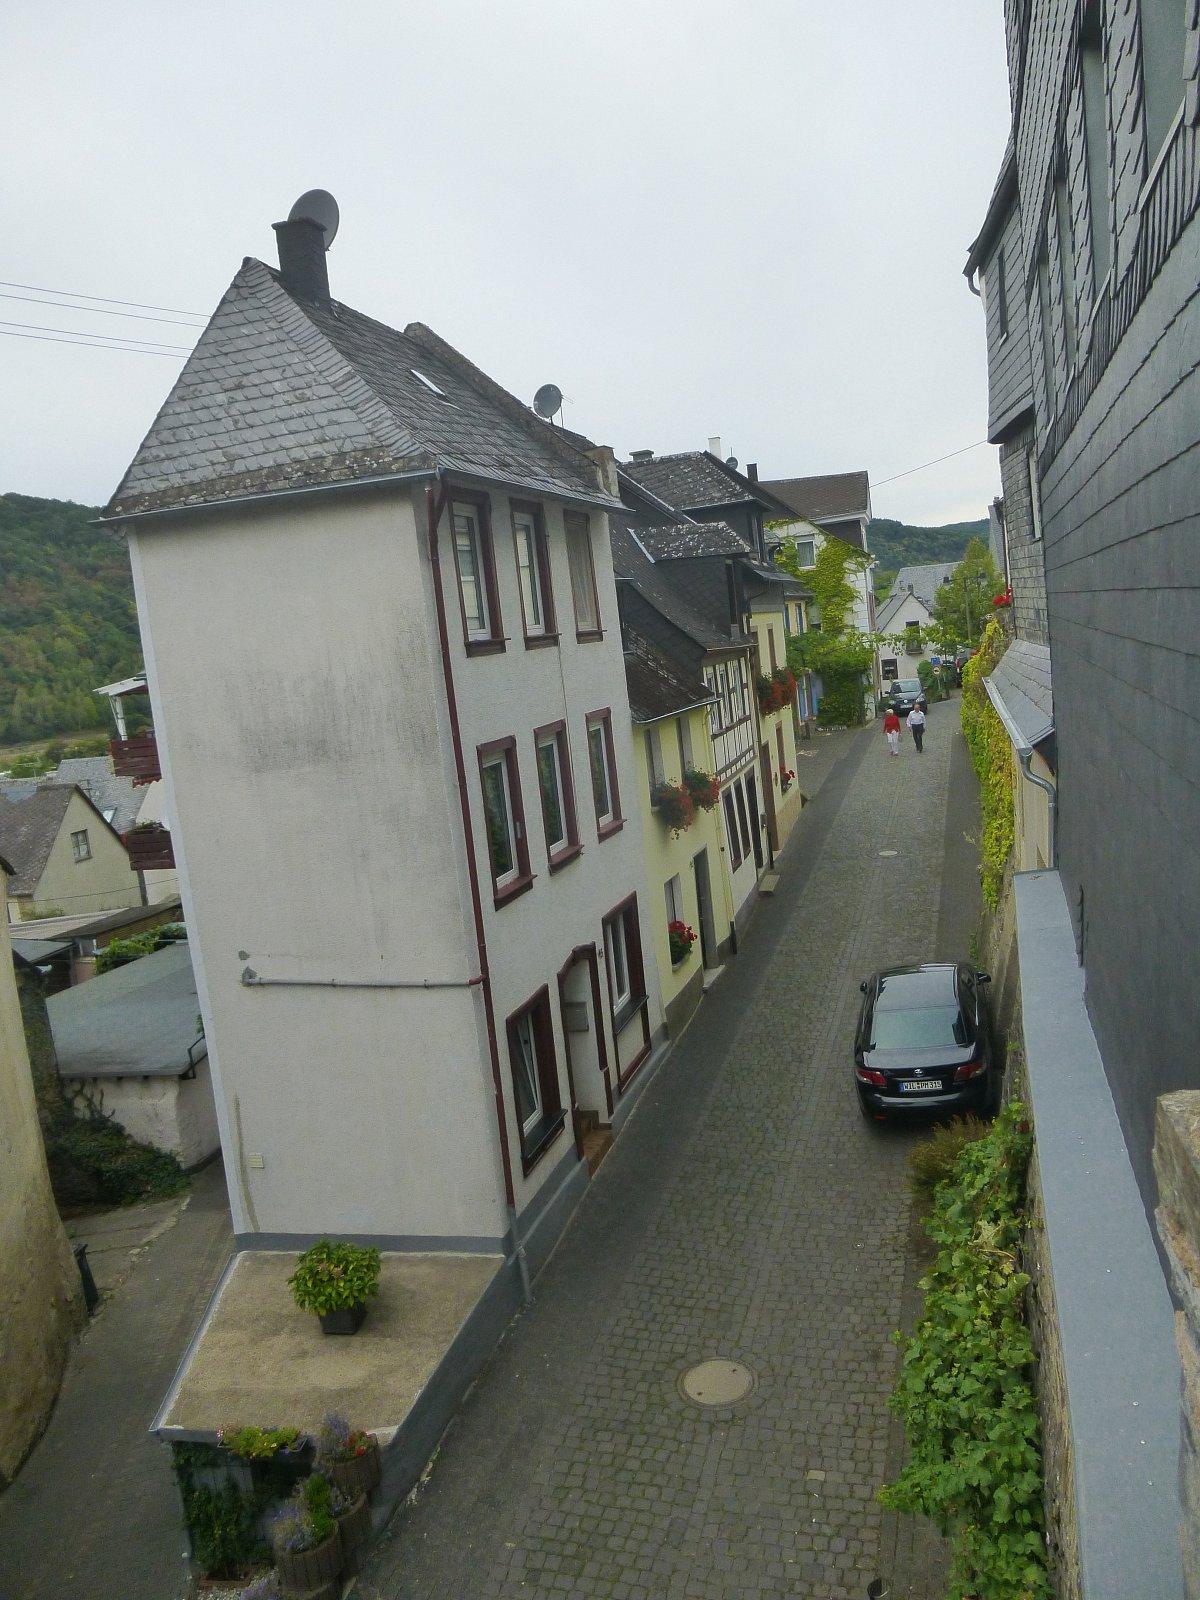 Spillestrapp Richtung Königstraße